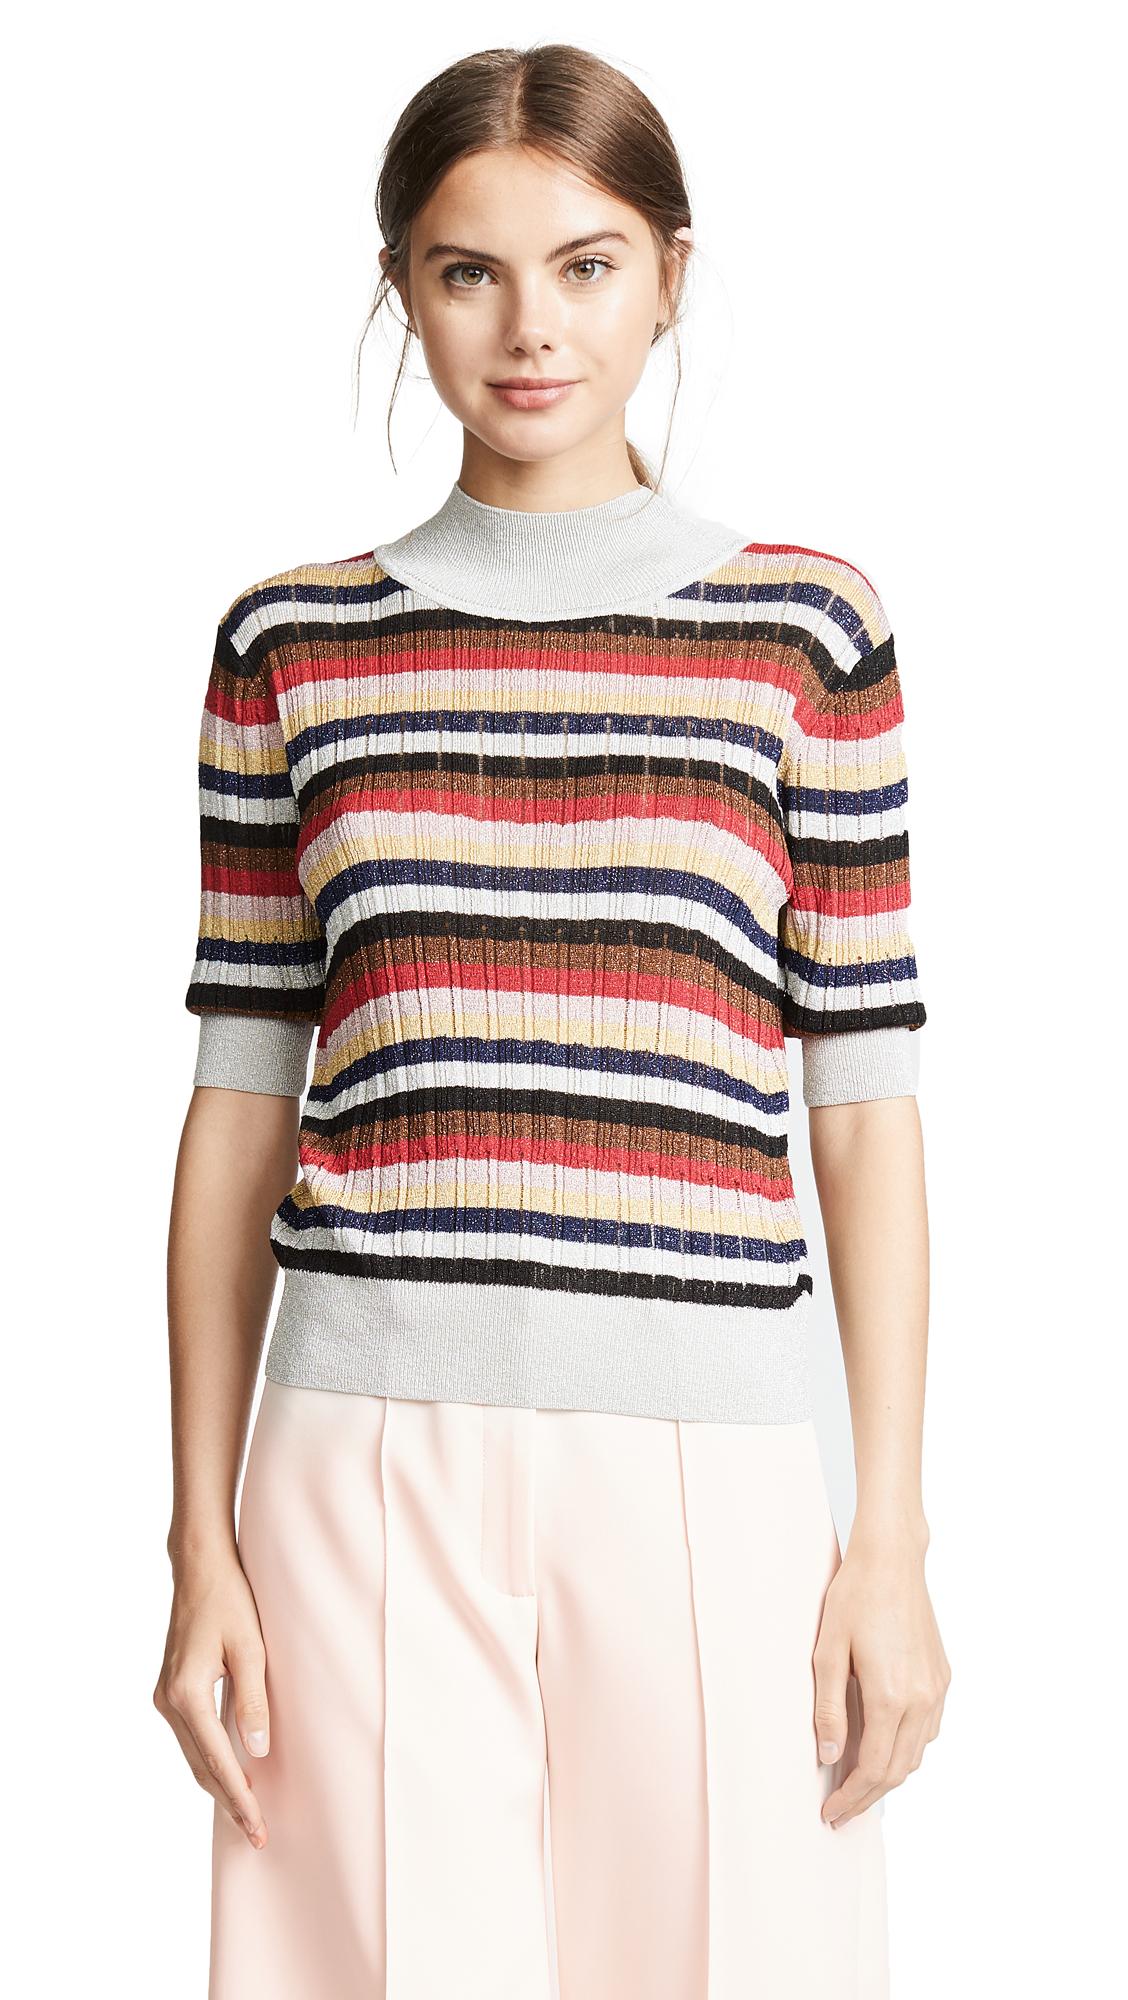 SONIA RYKIEL Multicolor Striped Knit Top in Metallic